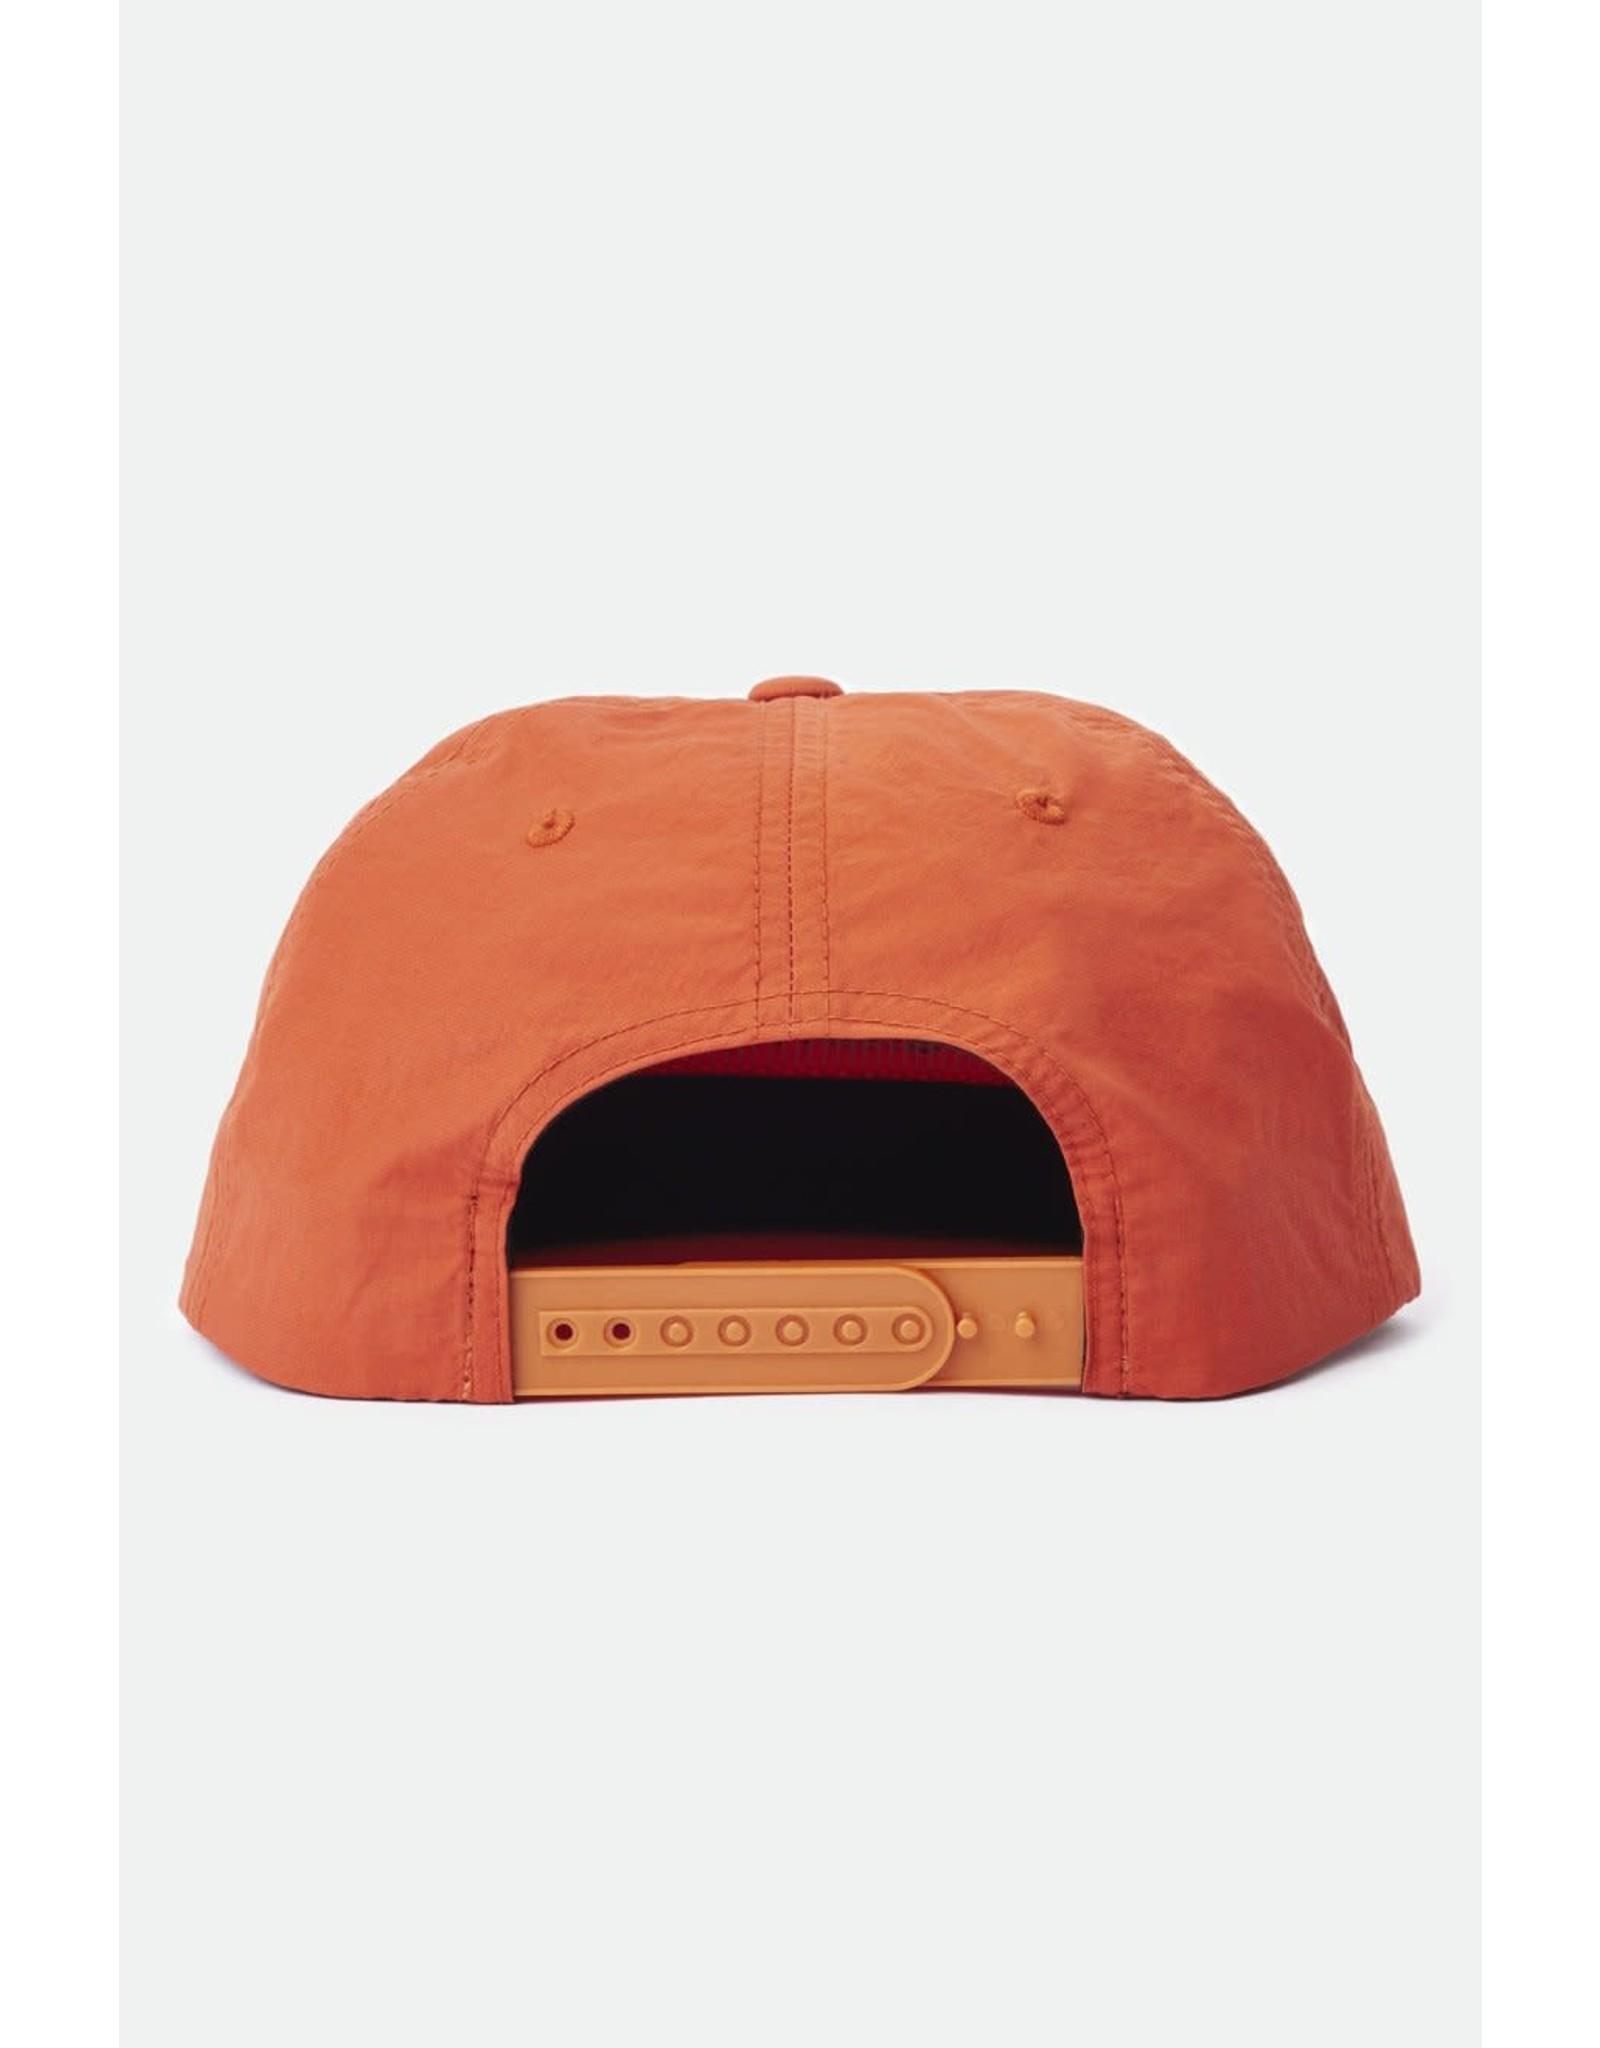 Brixton - Baseball Hat in Black & White or Orange